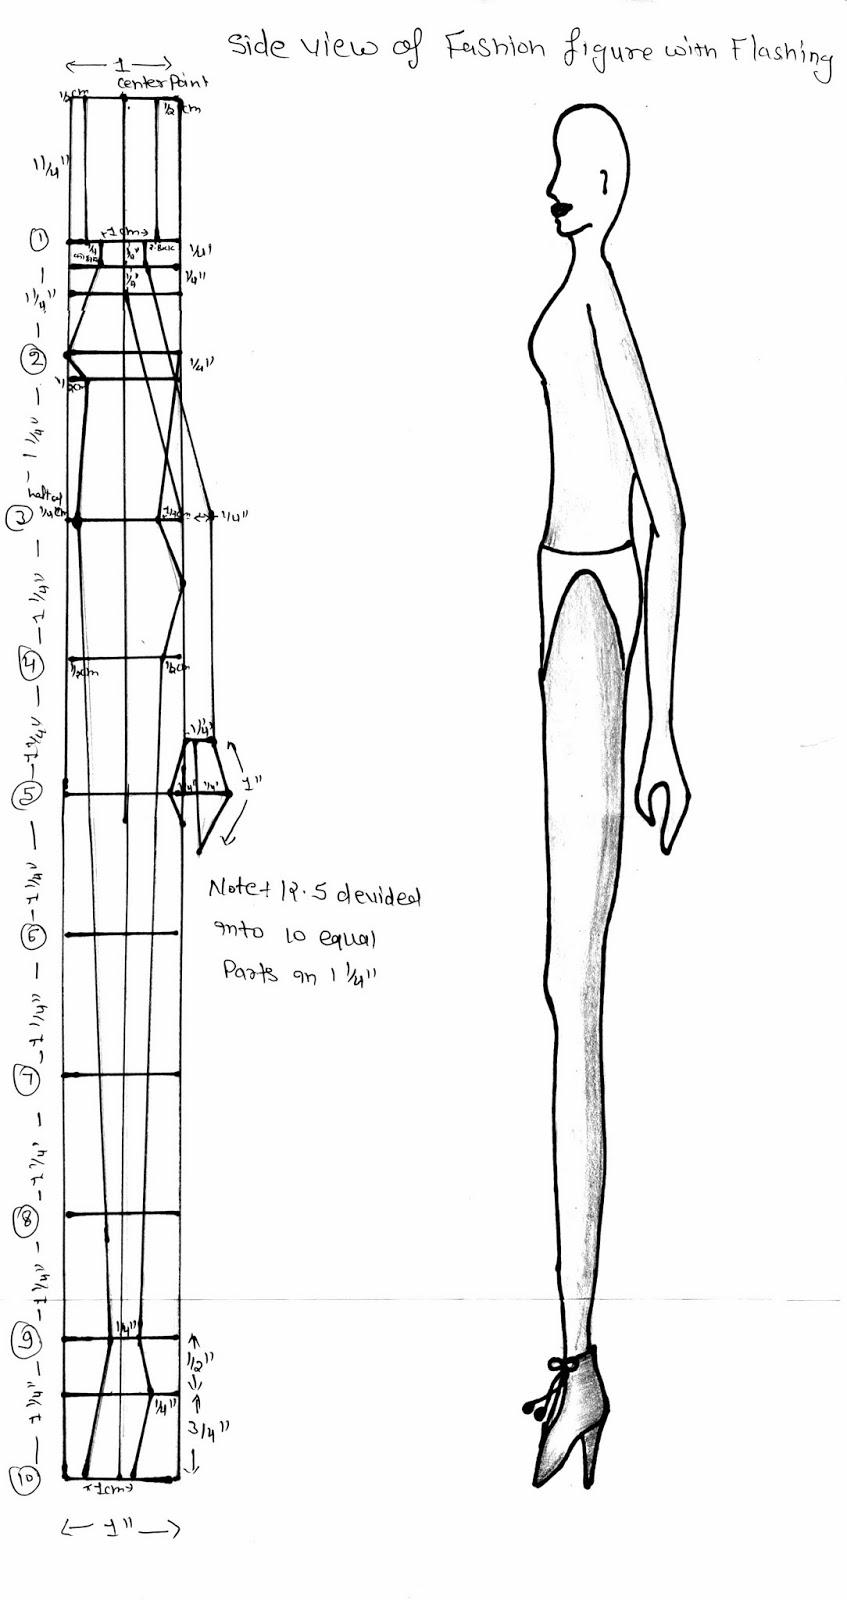 Online Fashion Education Fashion Design Sketch Sketching Is Beginner Step Iv In Fashion Design